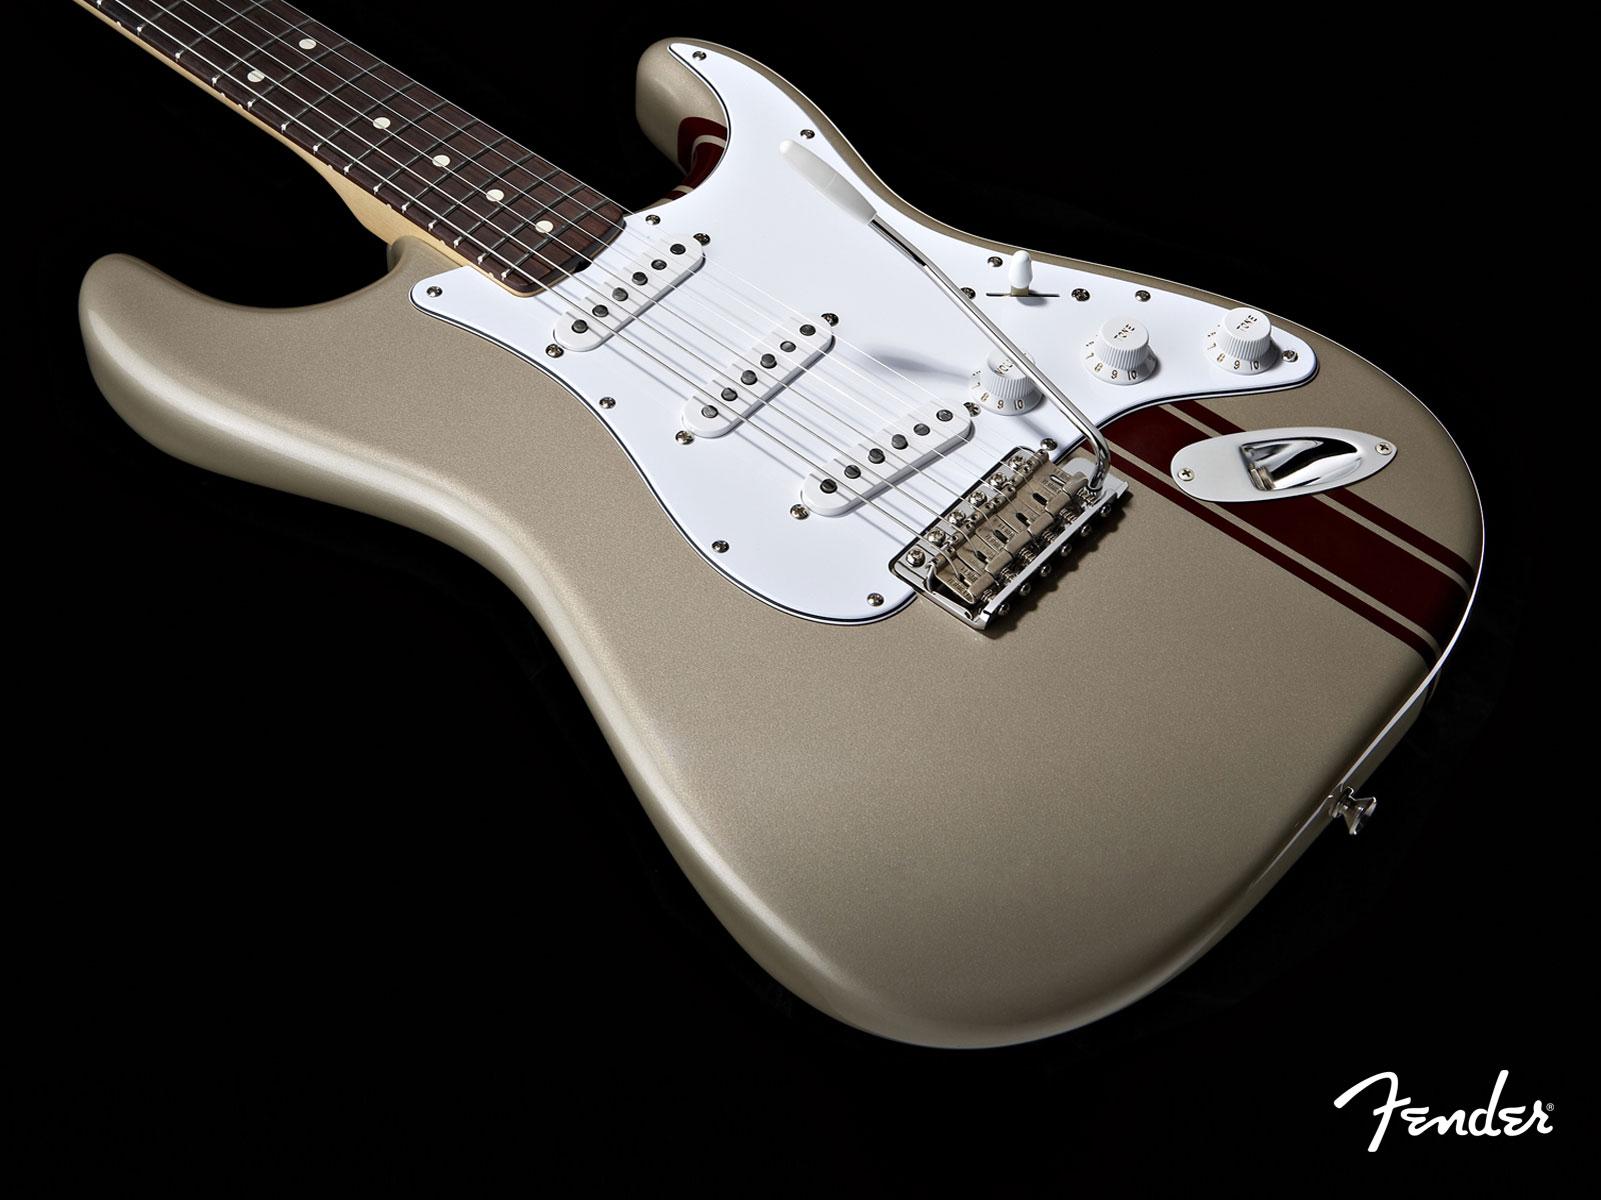 Awesome 3D Fender Guitar Wallpaper Wallpaper WallpaperLepi 1601x1200